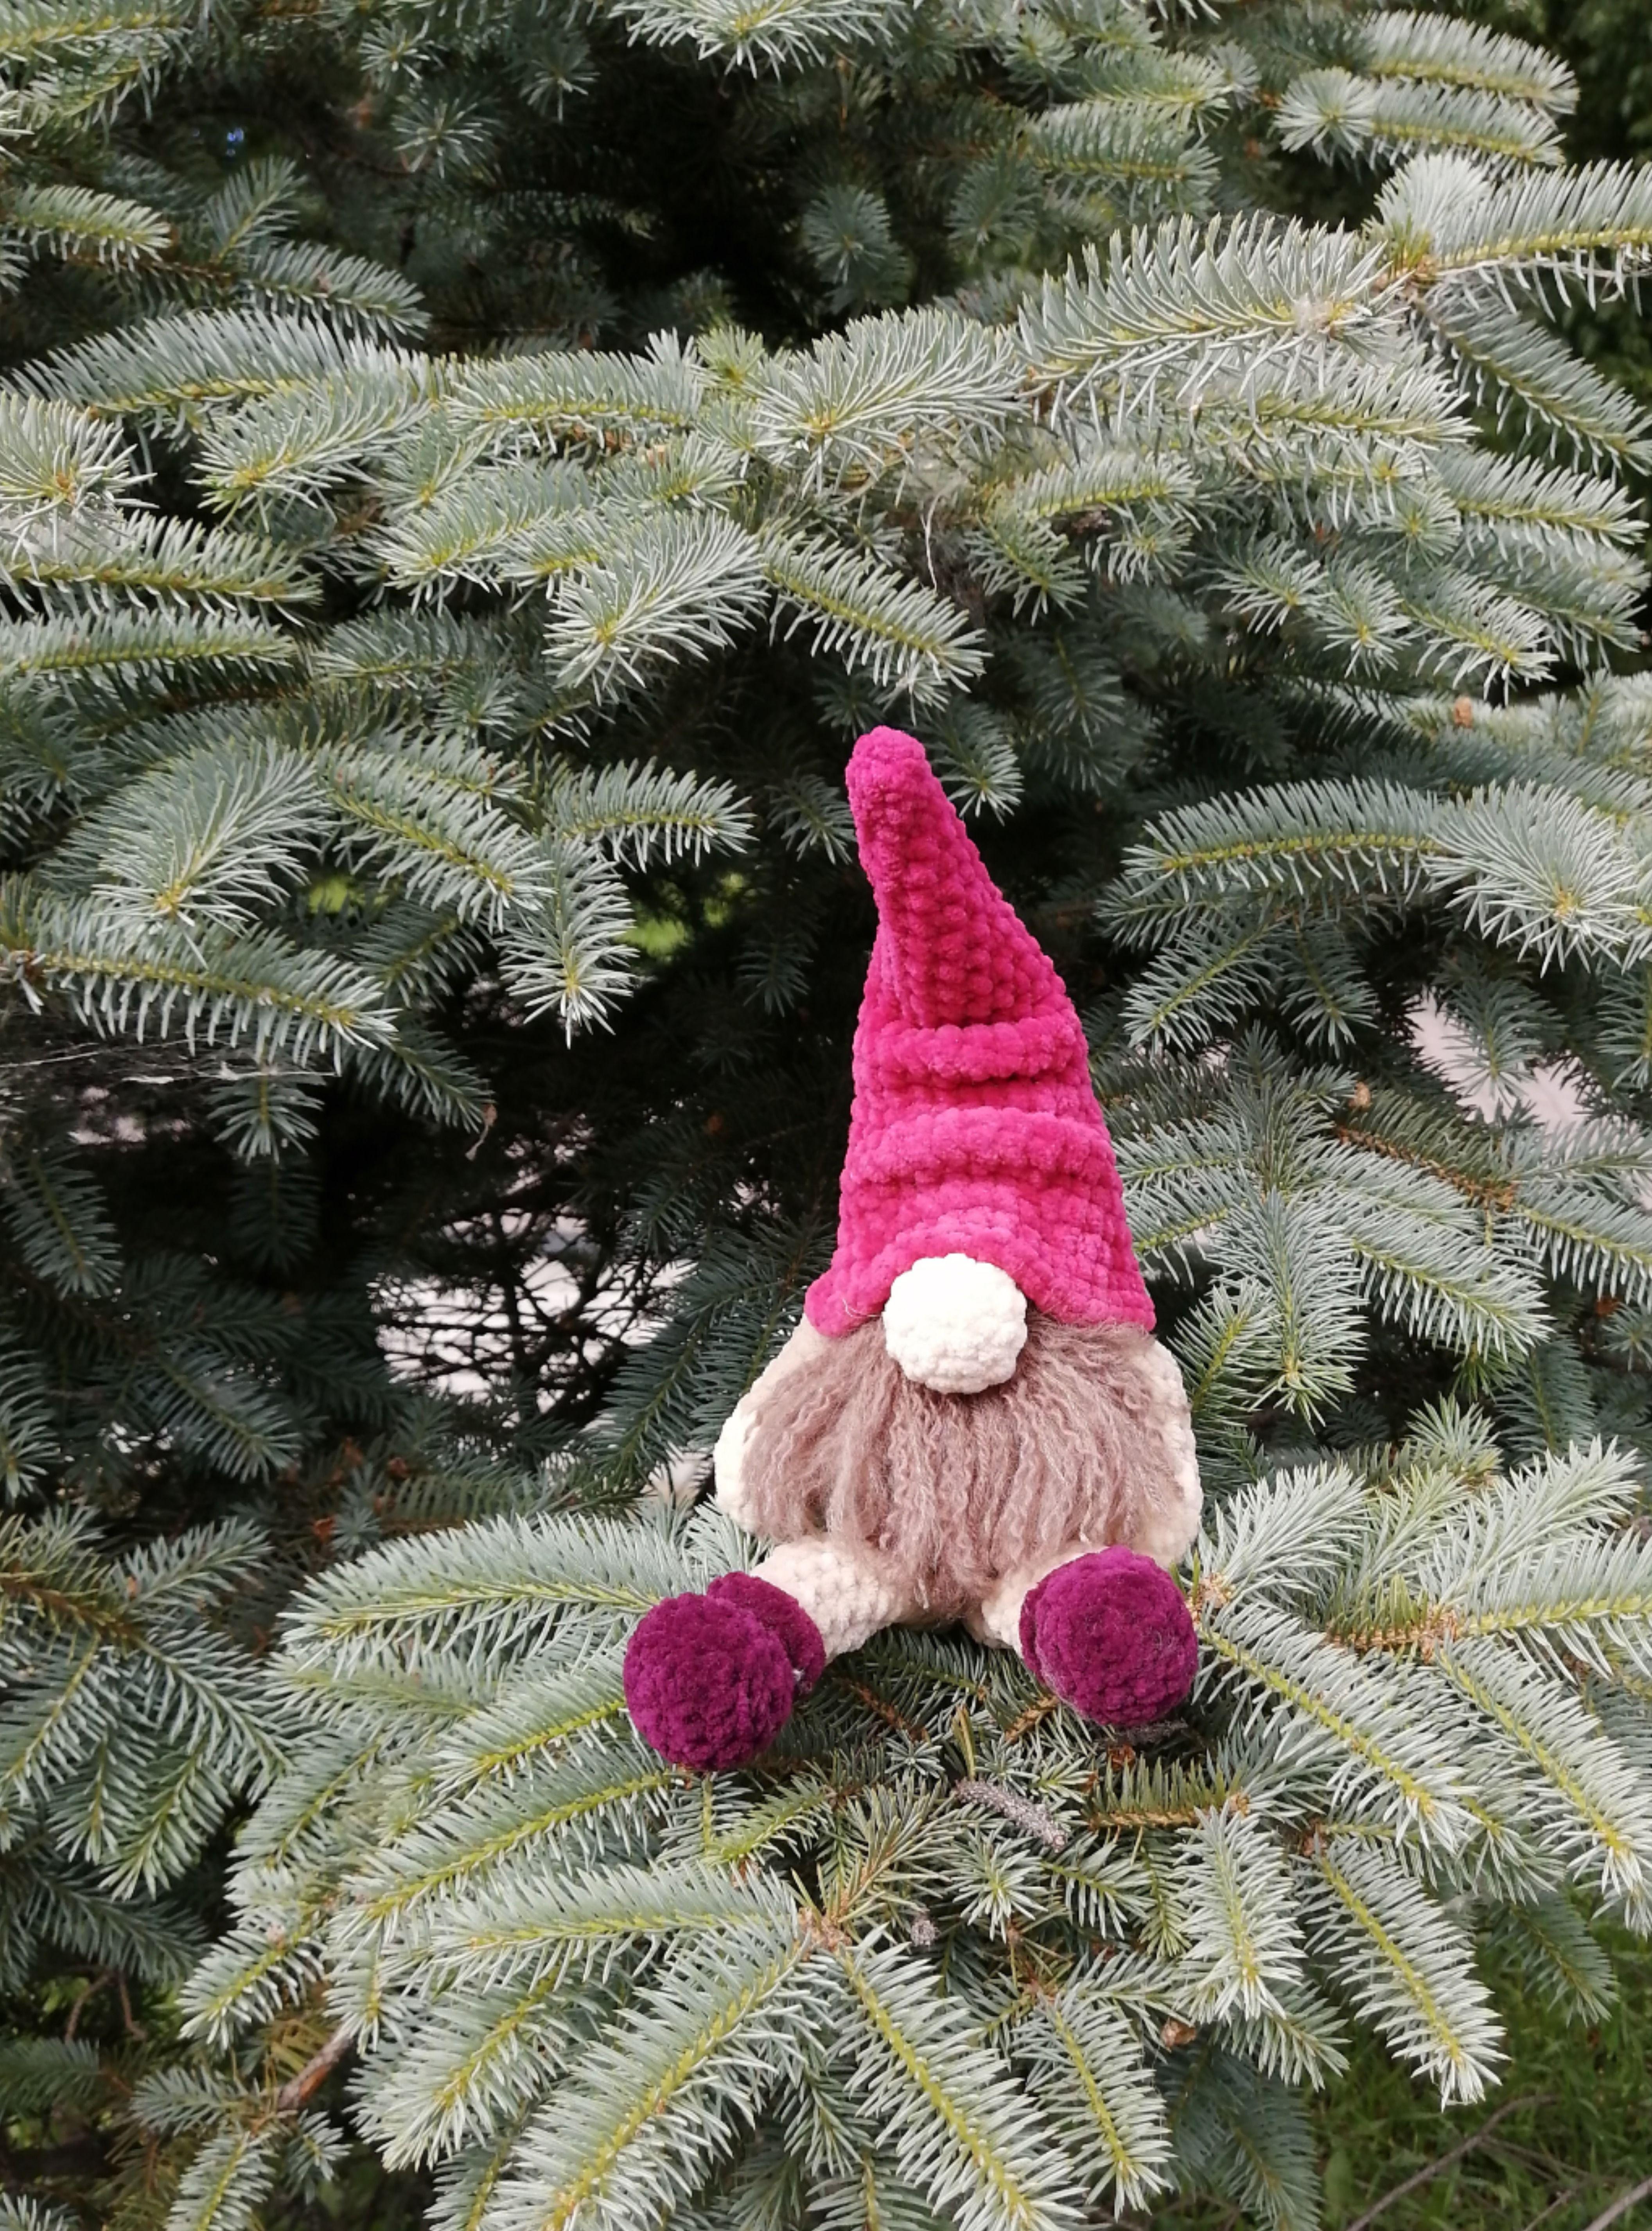 CROCHET PATTERN - Toy Dwarf Amigurumi Gnome Christmas Stuffed Doll handmade Simple Instructions